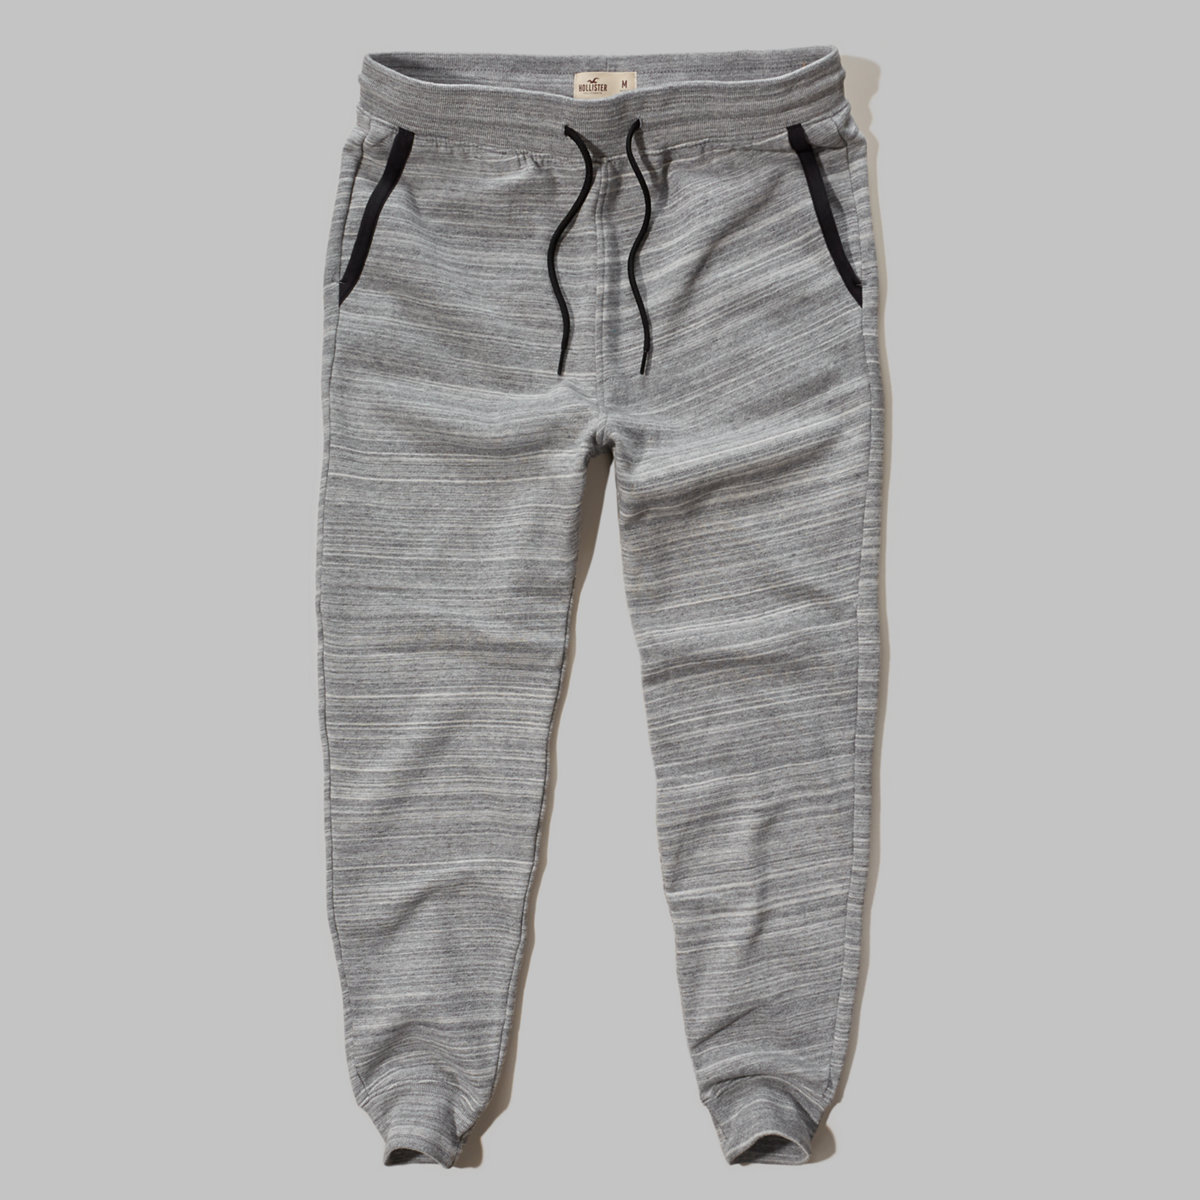 Hollister Contrast Fleece Jogger Pants